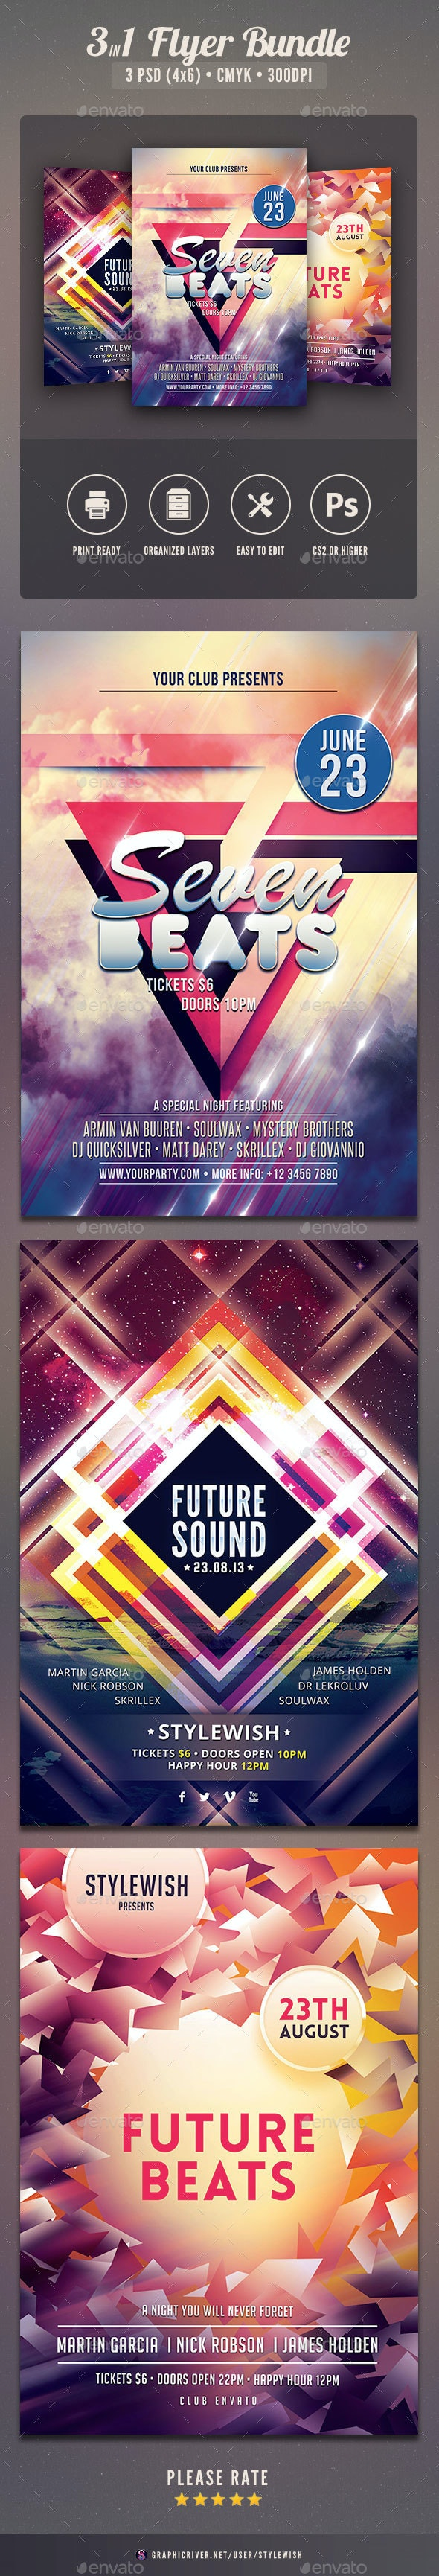 Future Party Flyer Bundle - Clubs & Parties Events